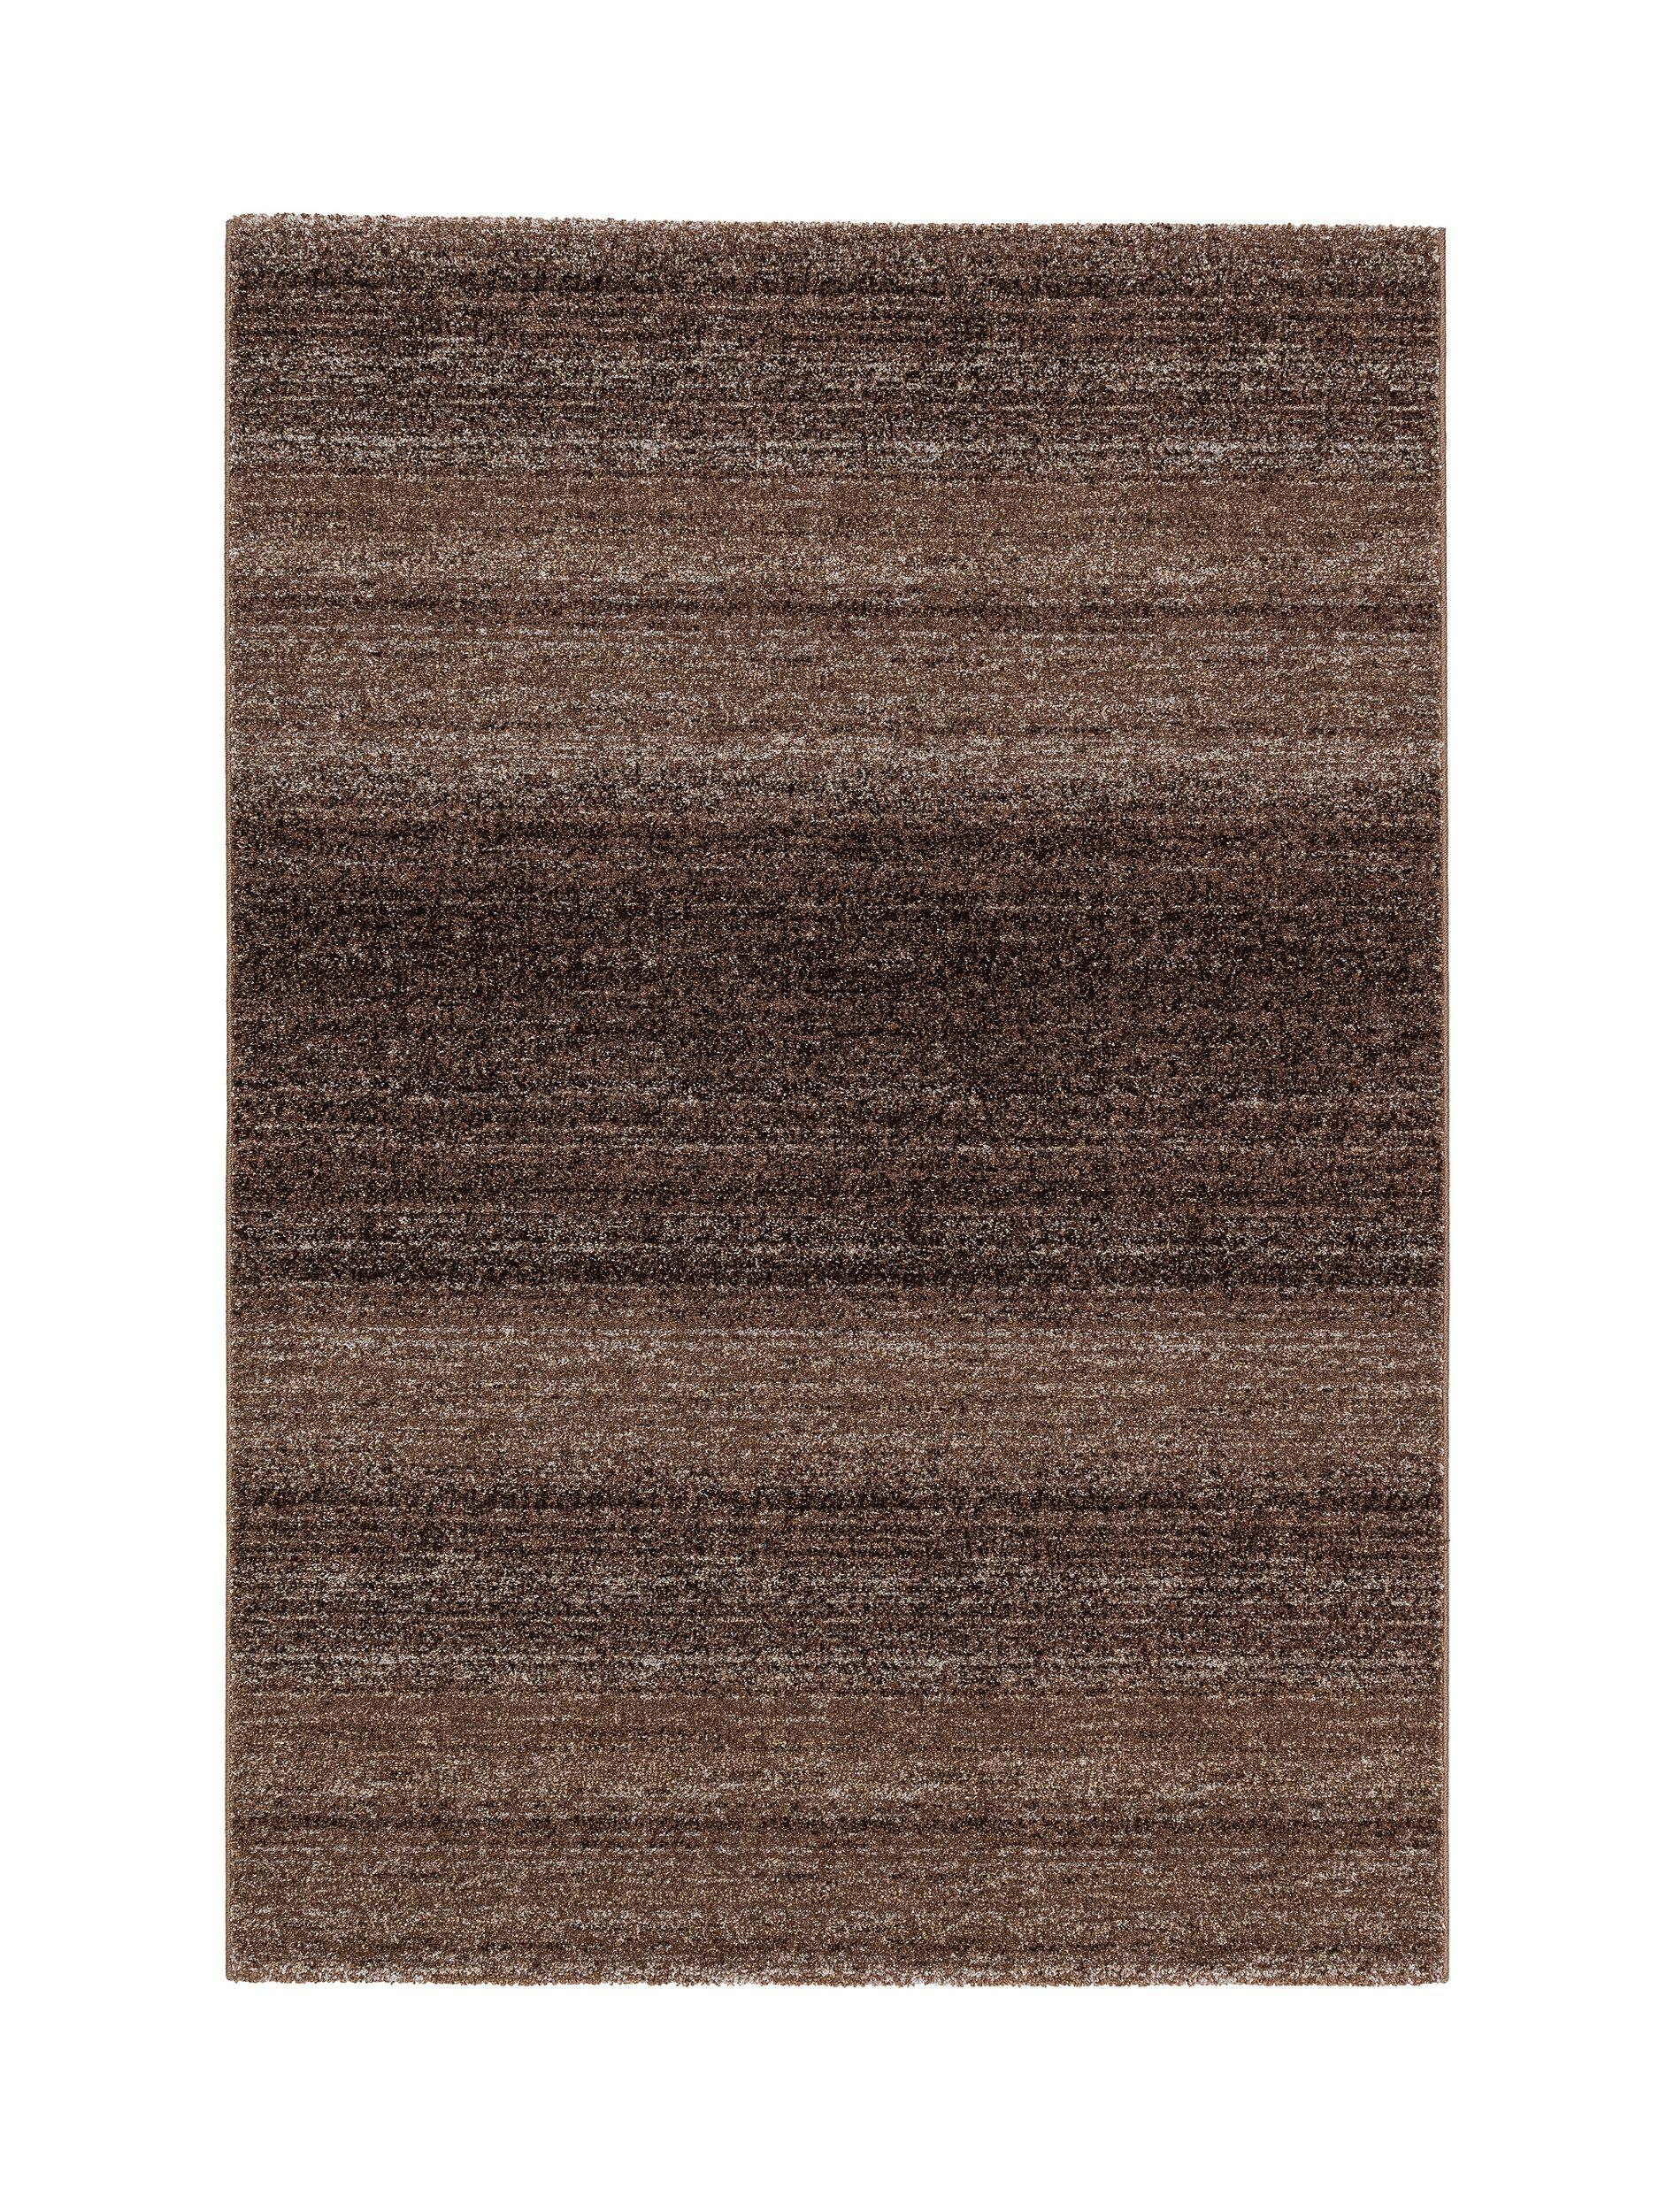 Teppich wm 133x190cm CARPI